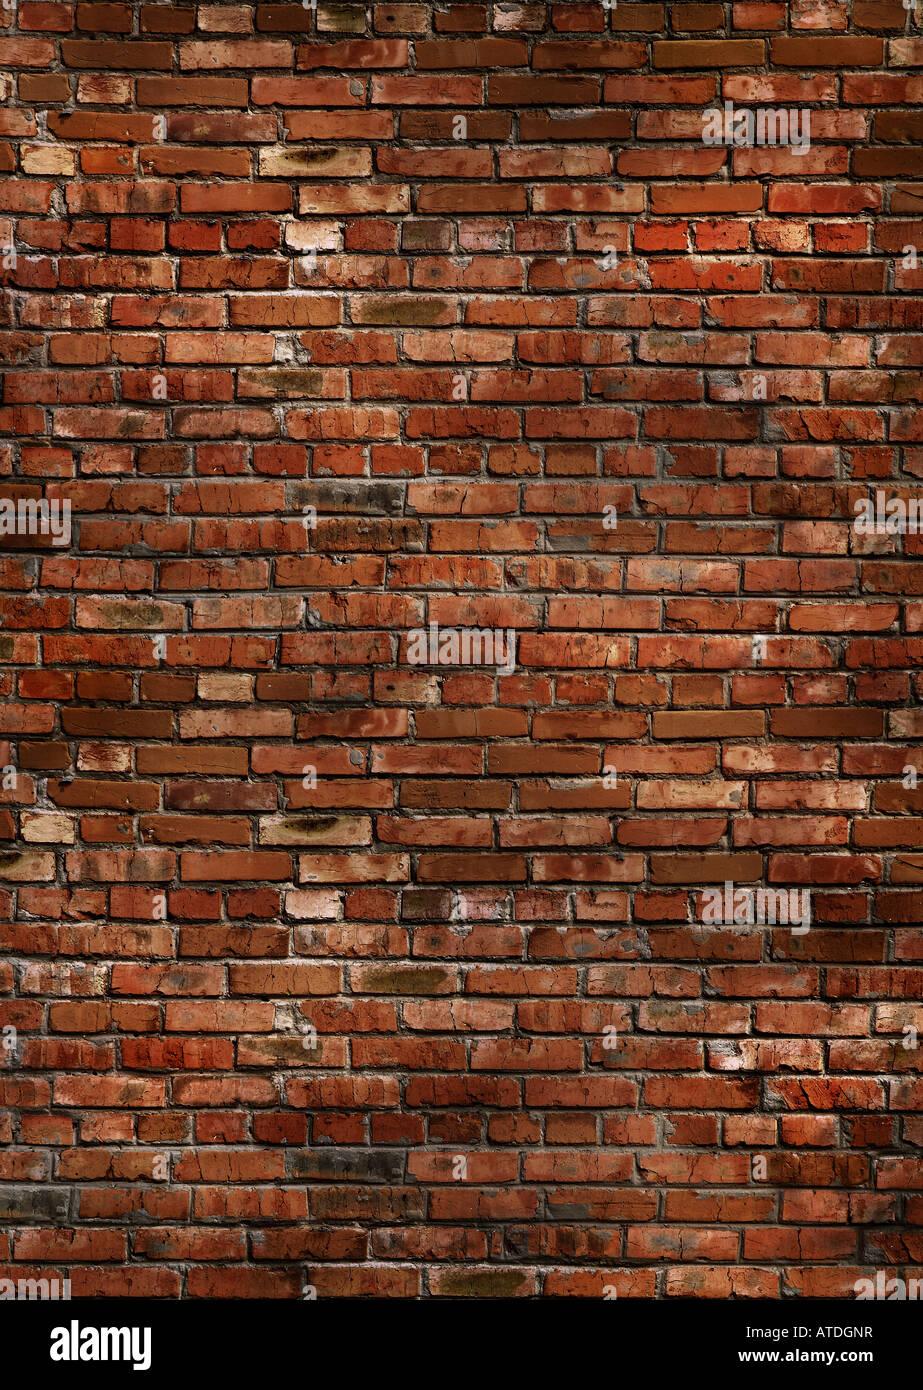 Textura de pared de ladrillo rojo oscuro Imagen De Stock